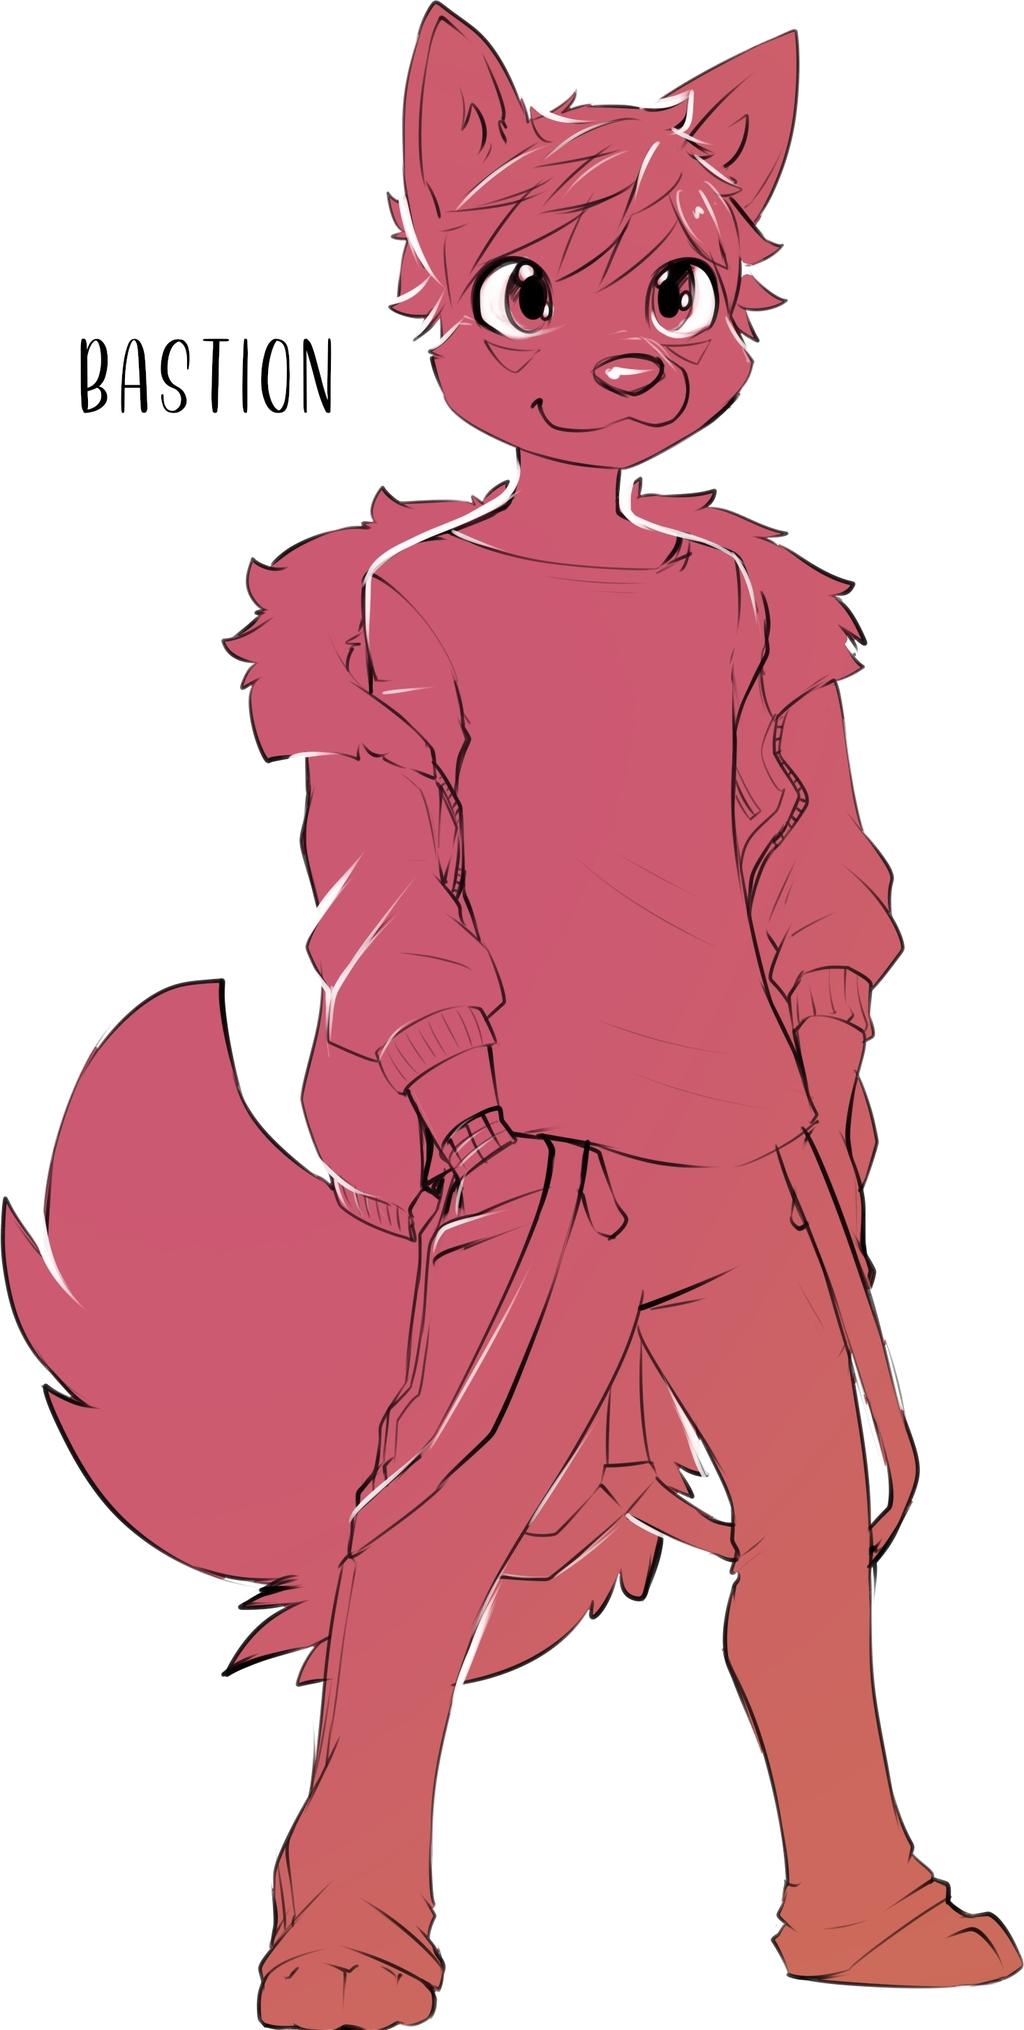 [$] CyberBwolf